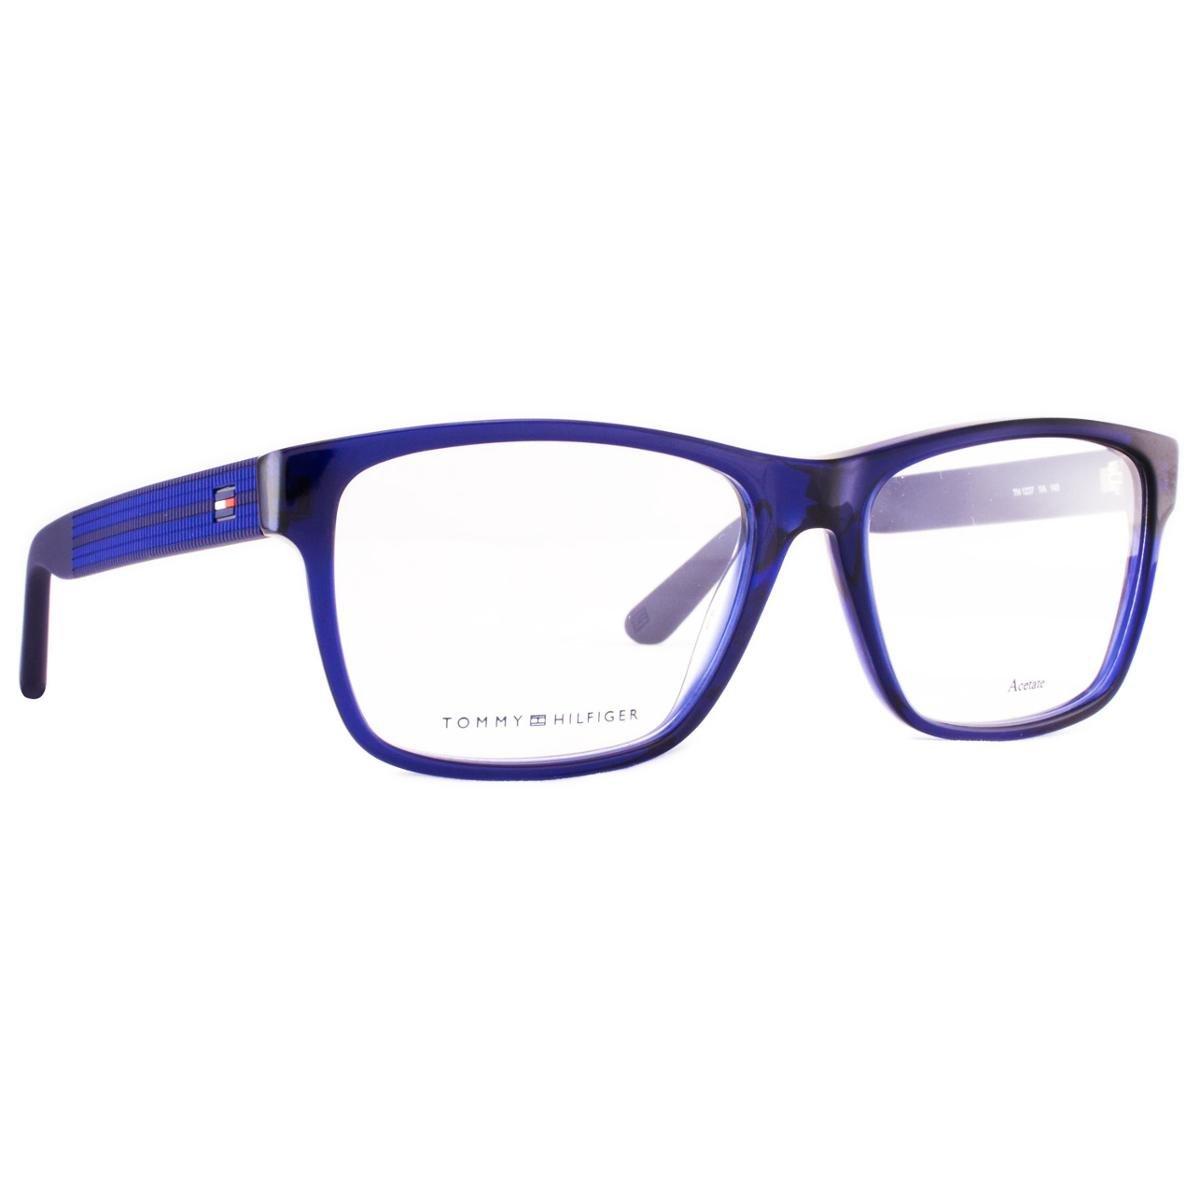 99da38e1e536d Óculos Tommy Hilfiger TH1237 1 A 54 - Compre Agora   Zattini